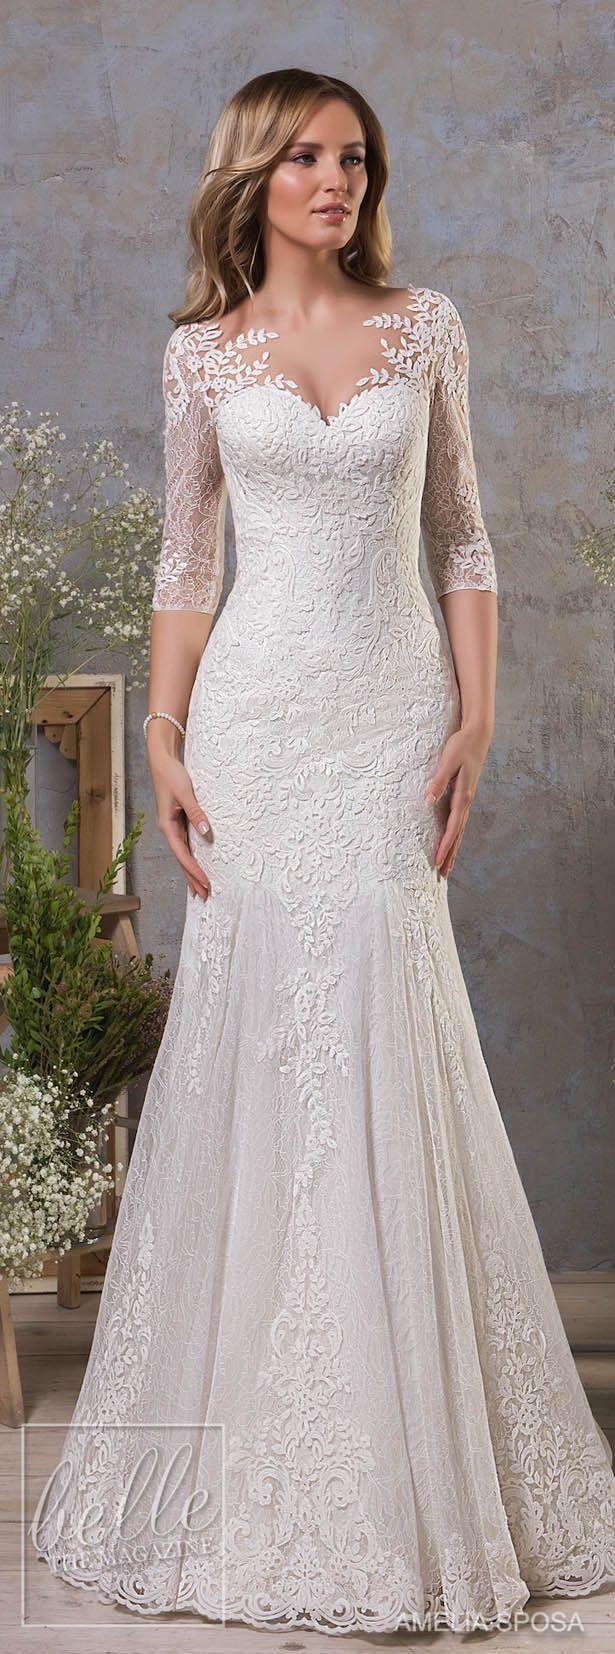 best wedding dresses images on pinterest bridal gowns short